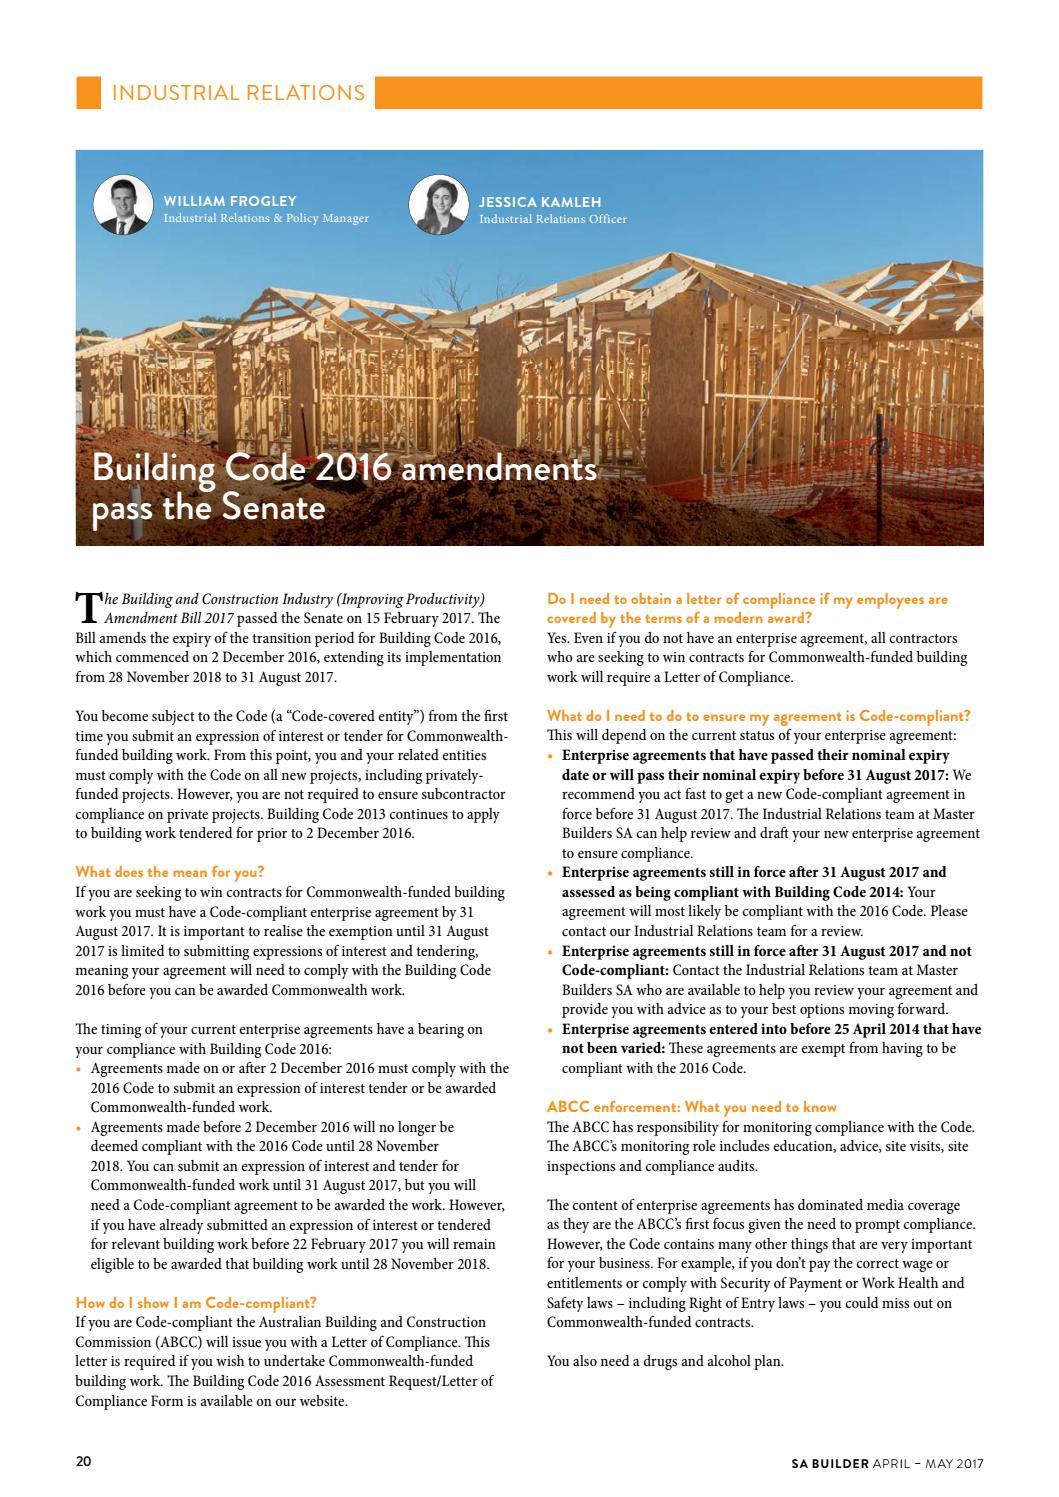 Sa Builder Master Builders South Australia By Arkmedia4217 Issuu